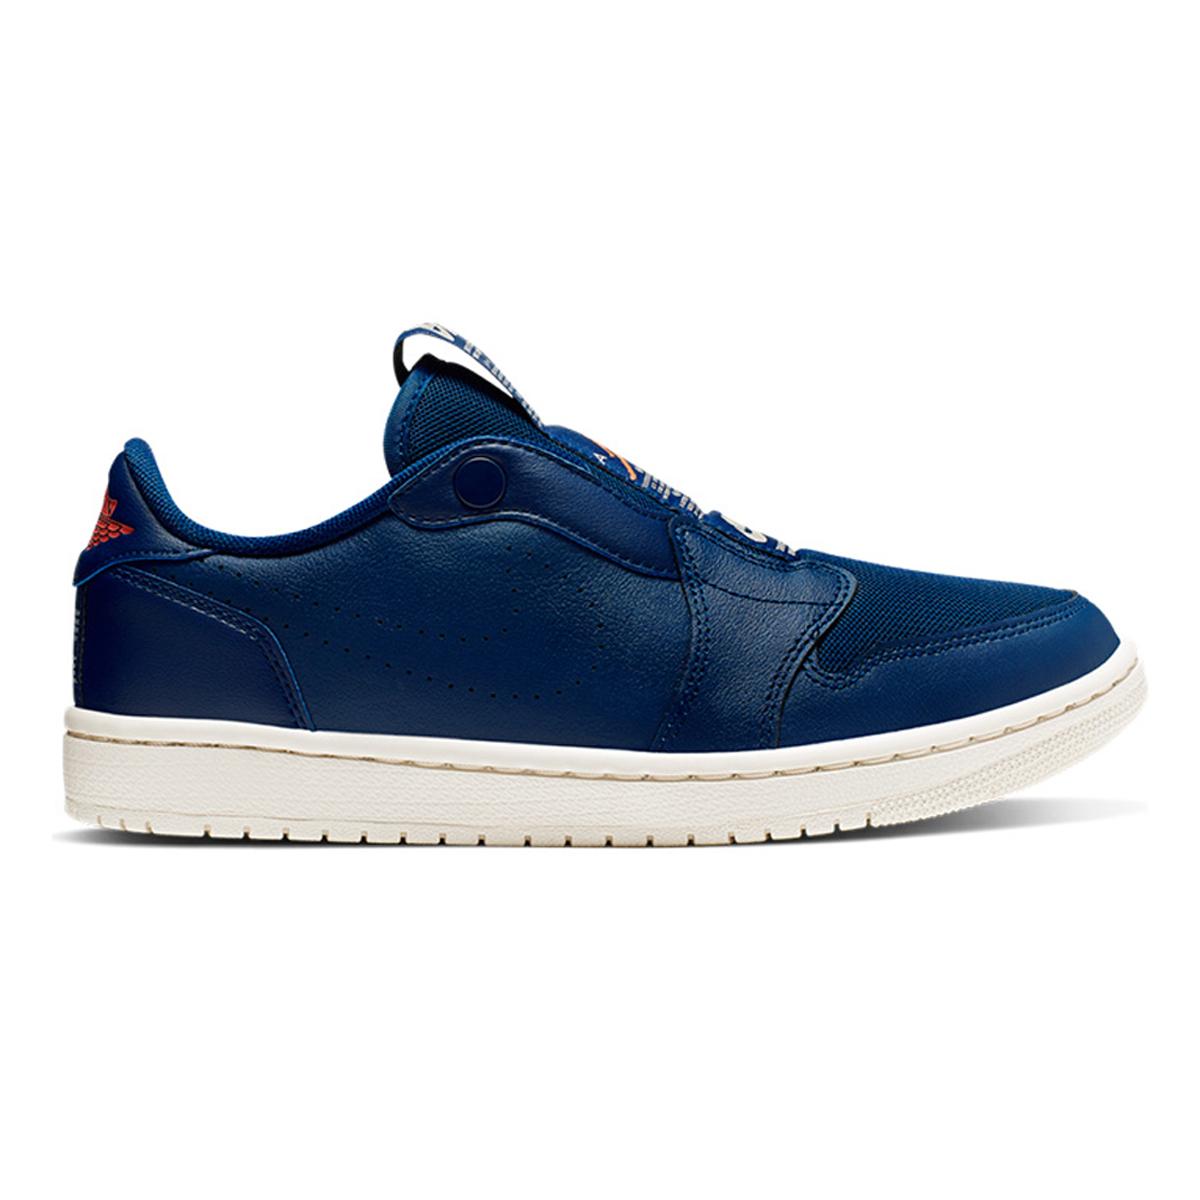 Instruir Bungalow Leche  Zapatillas Nike Jordan 1 Retro | Moov